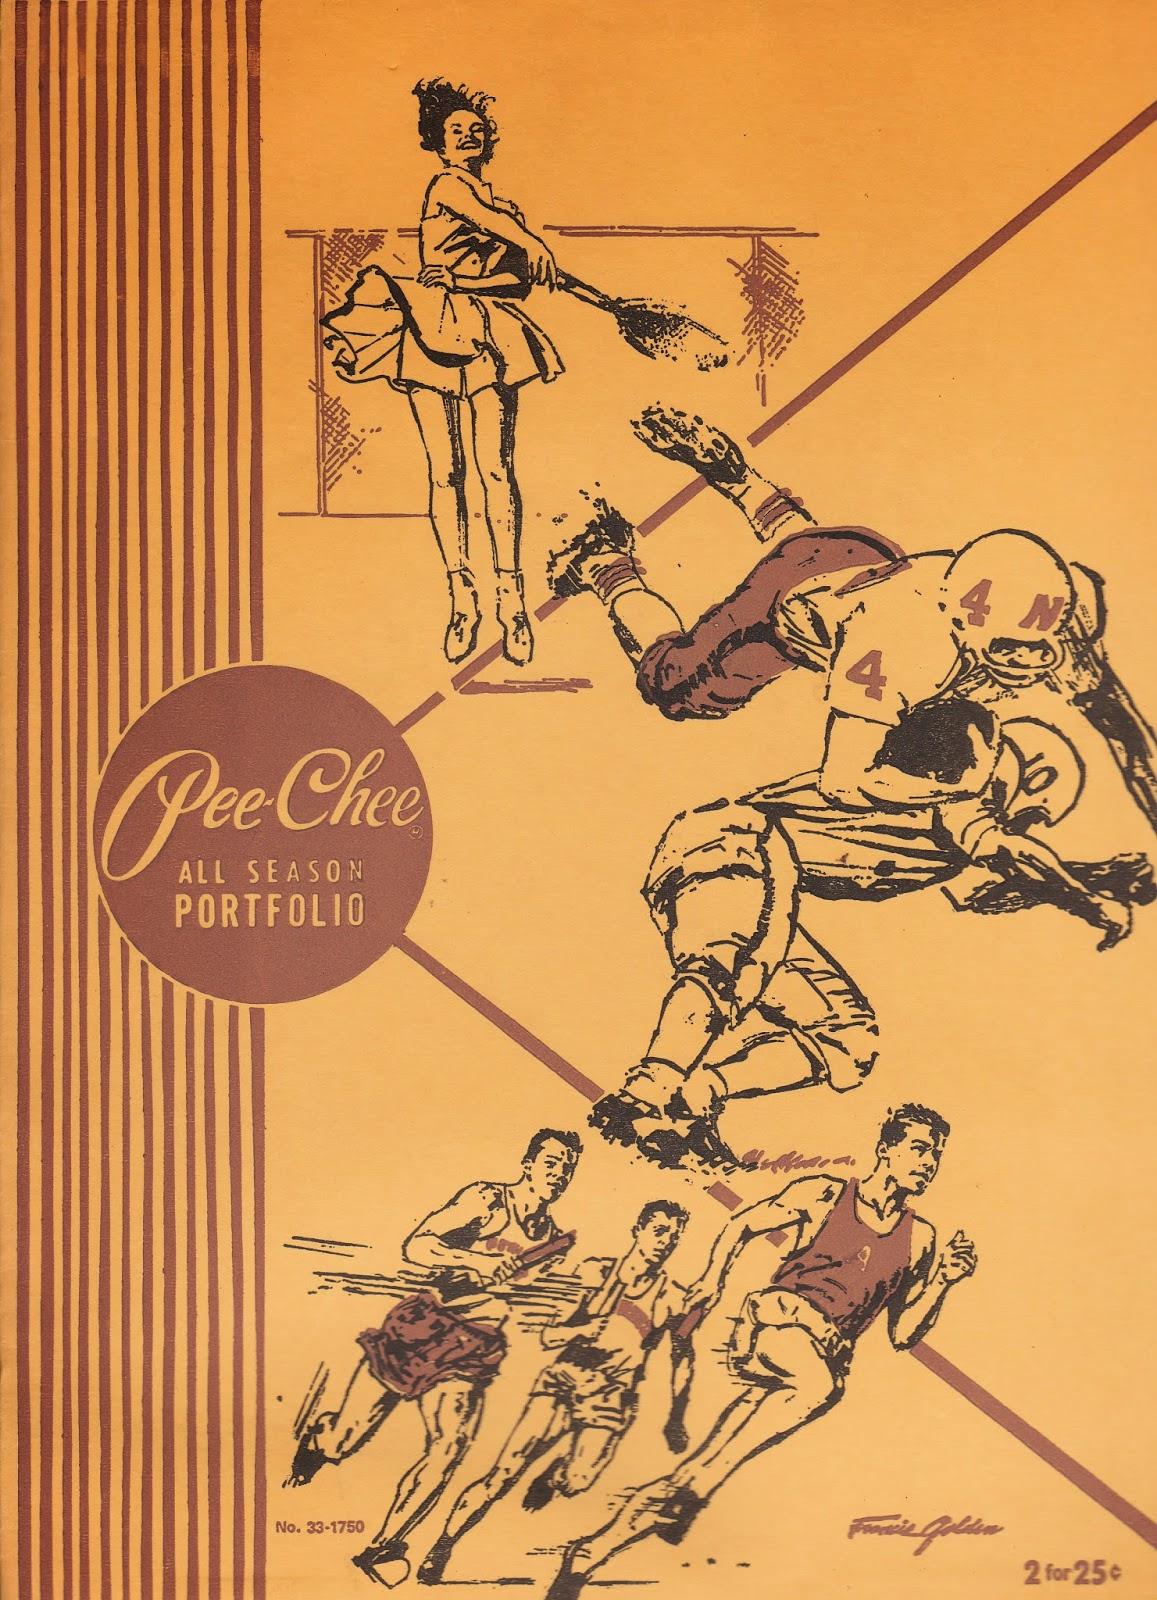 1943 pee chee Portfolio